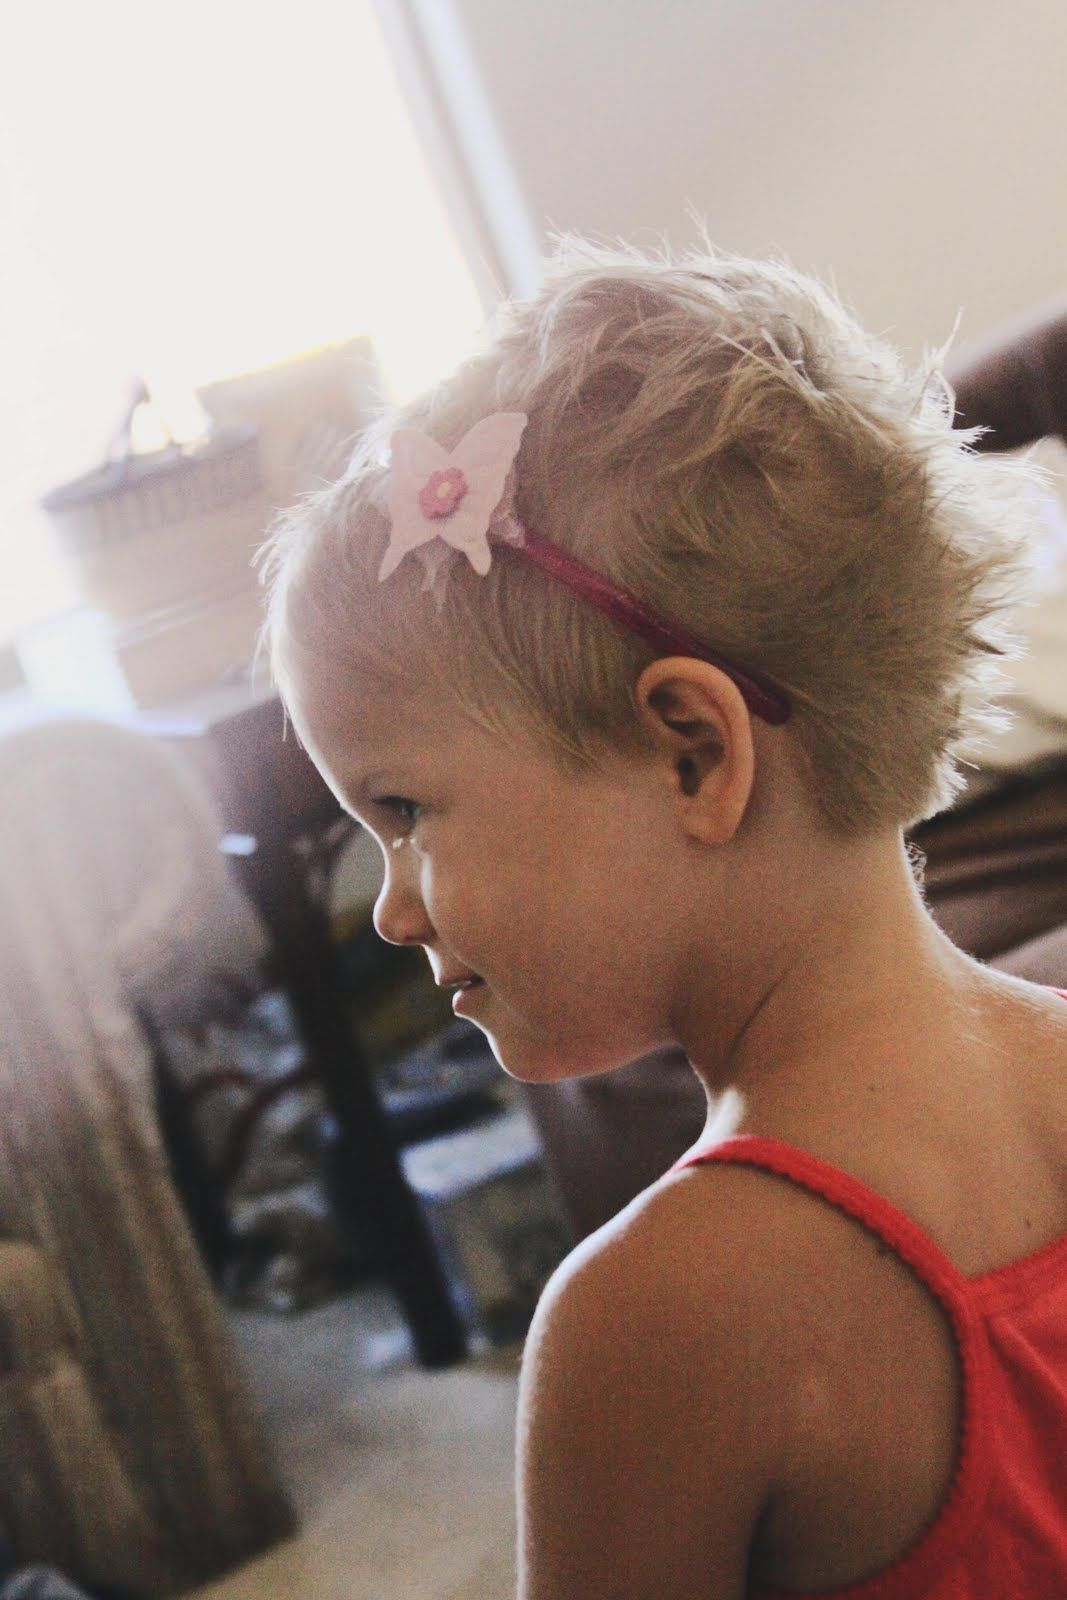 Little Girl Pixie Haircut April Daisys Room Pinterest Pixie